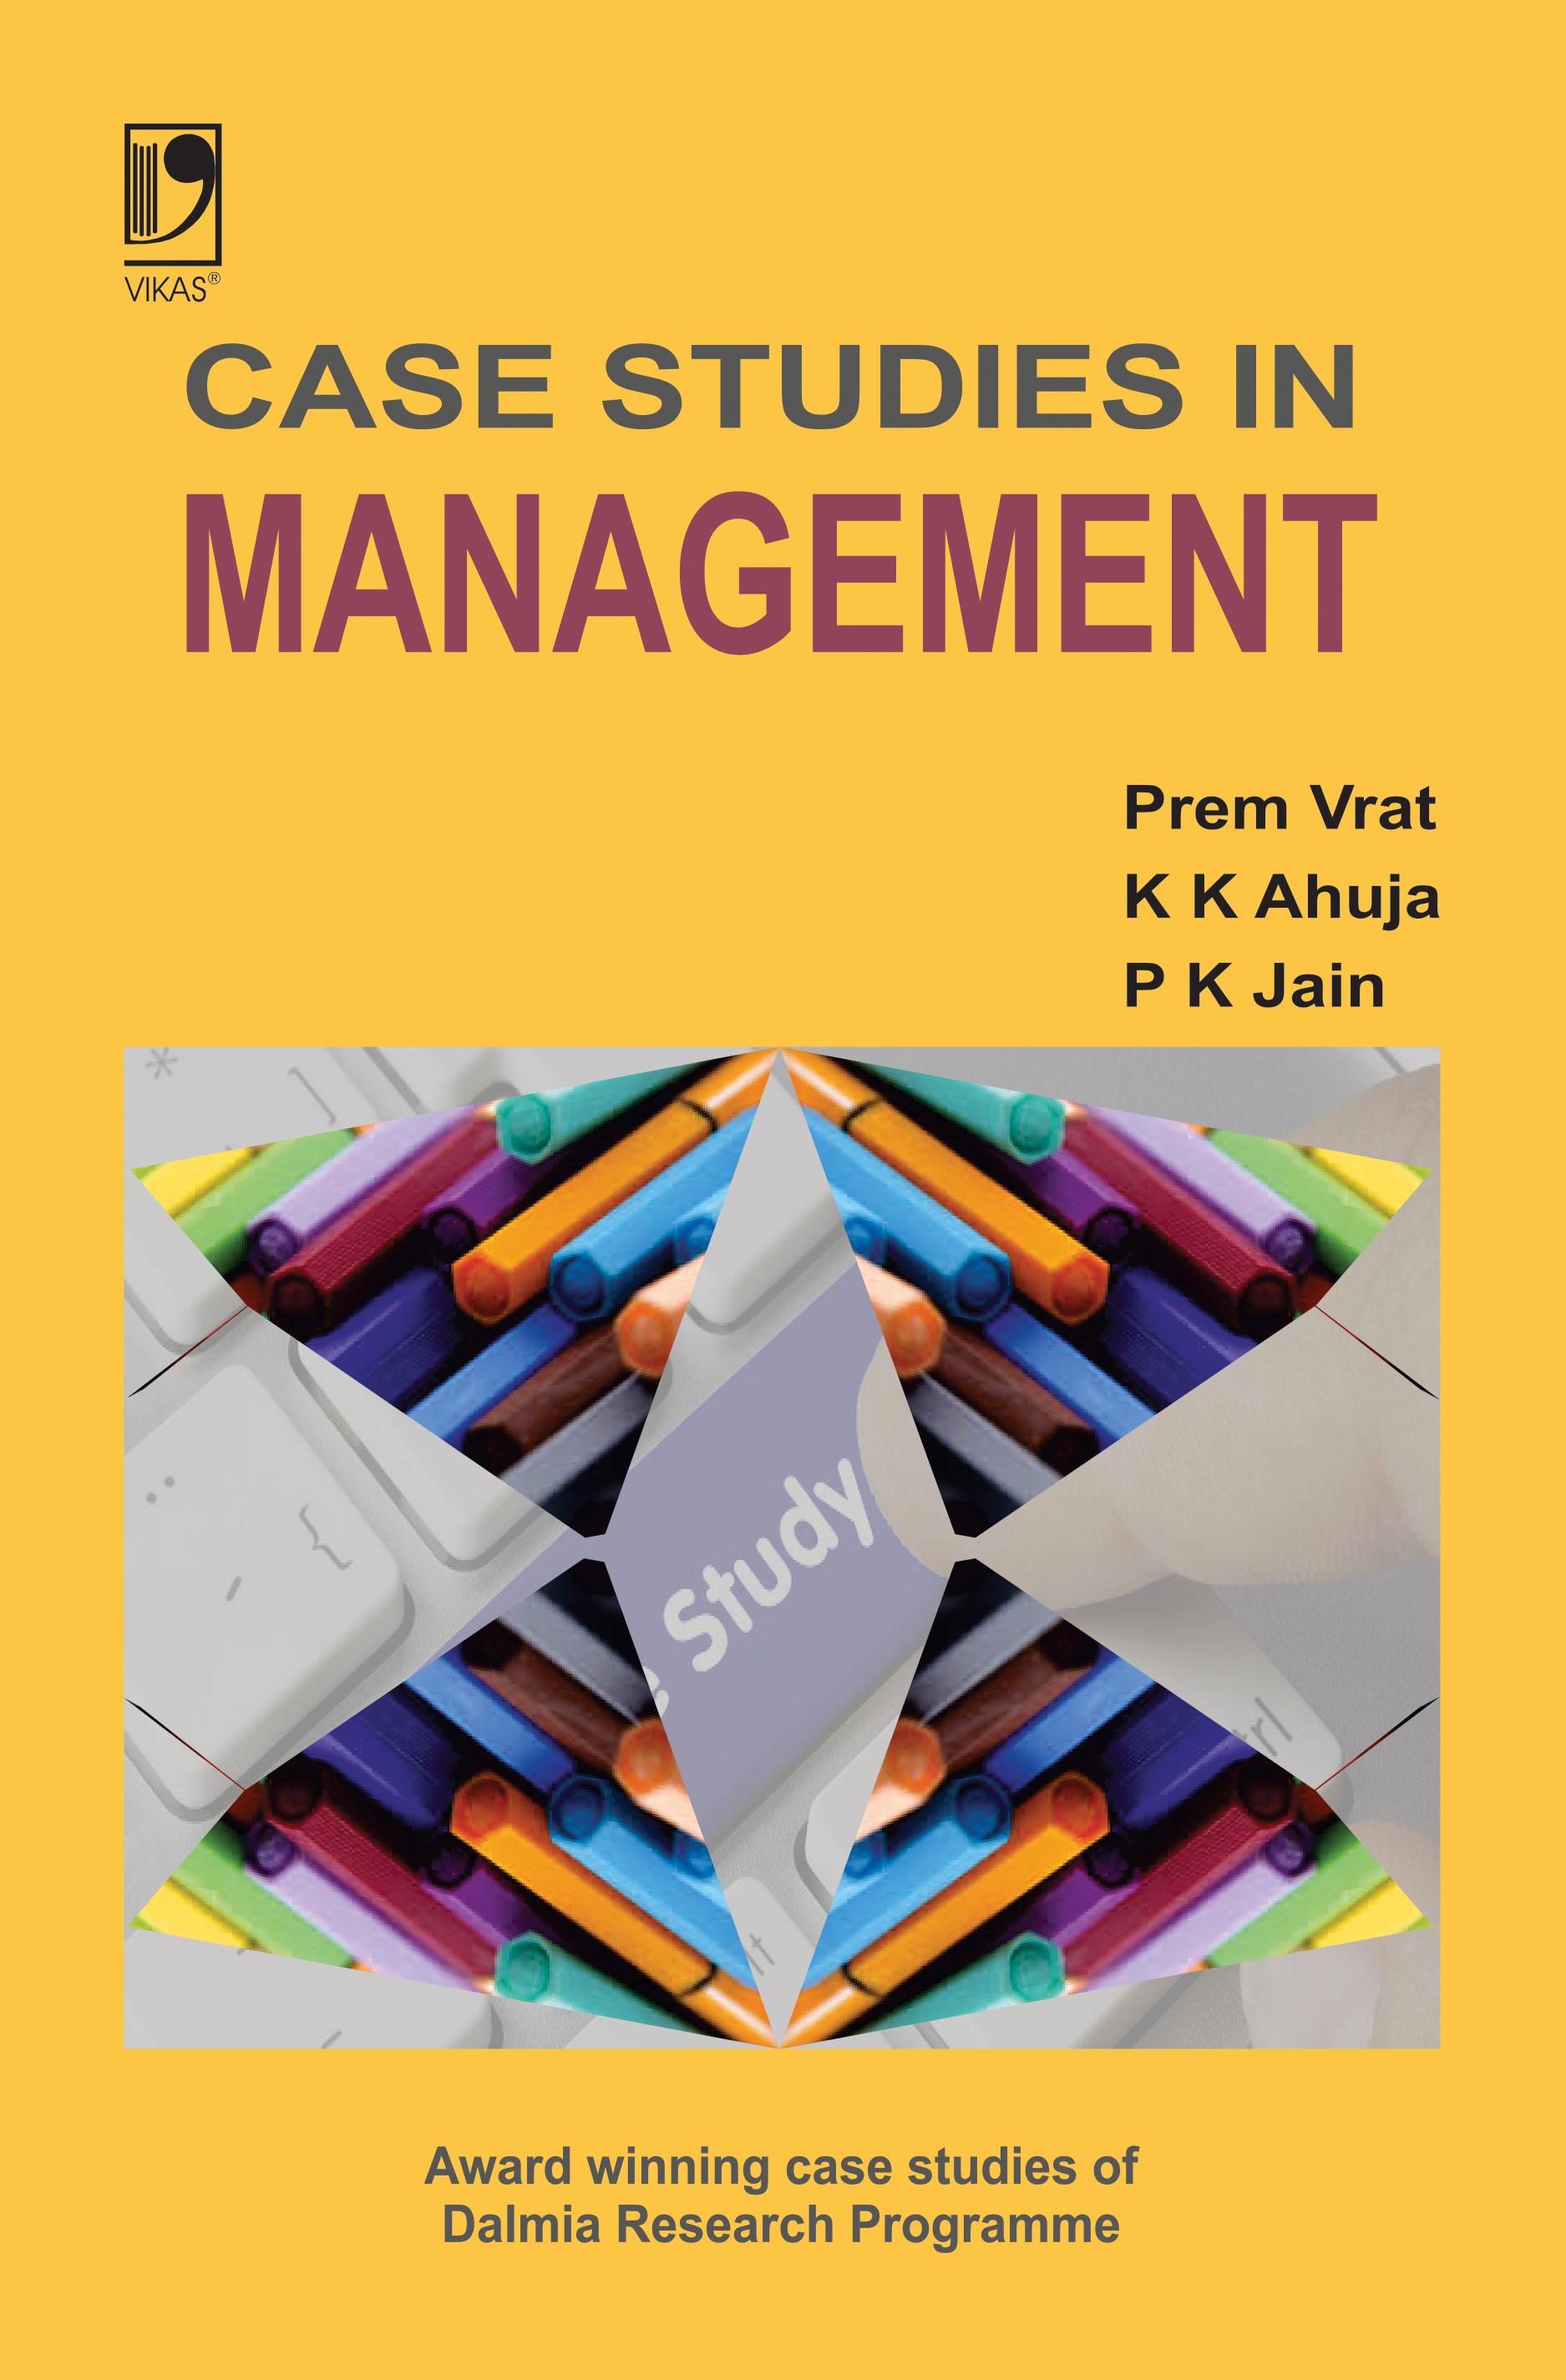 Case Studies in Management by  Prem Vrat